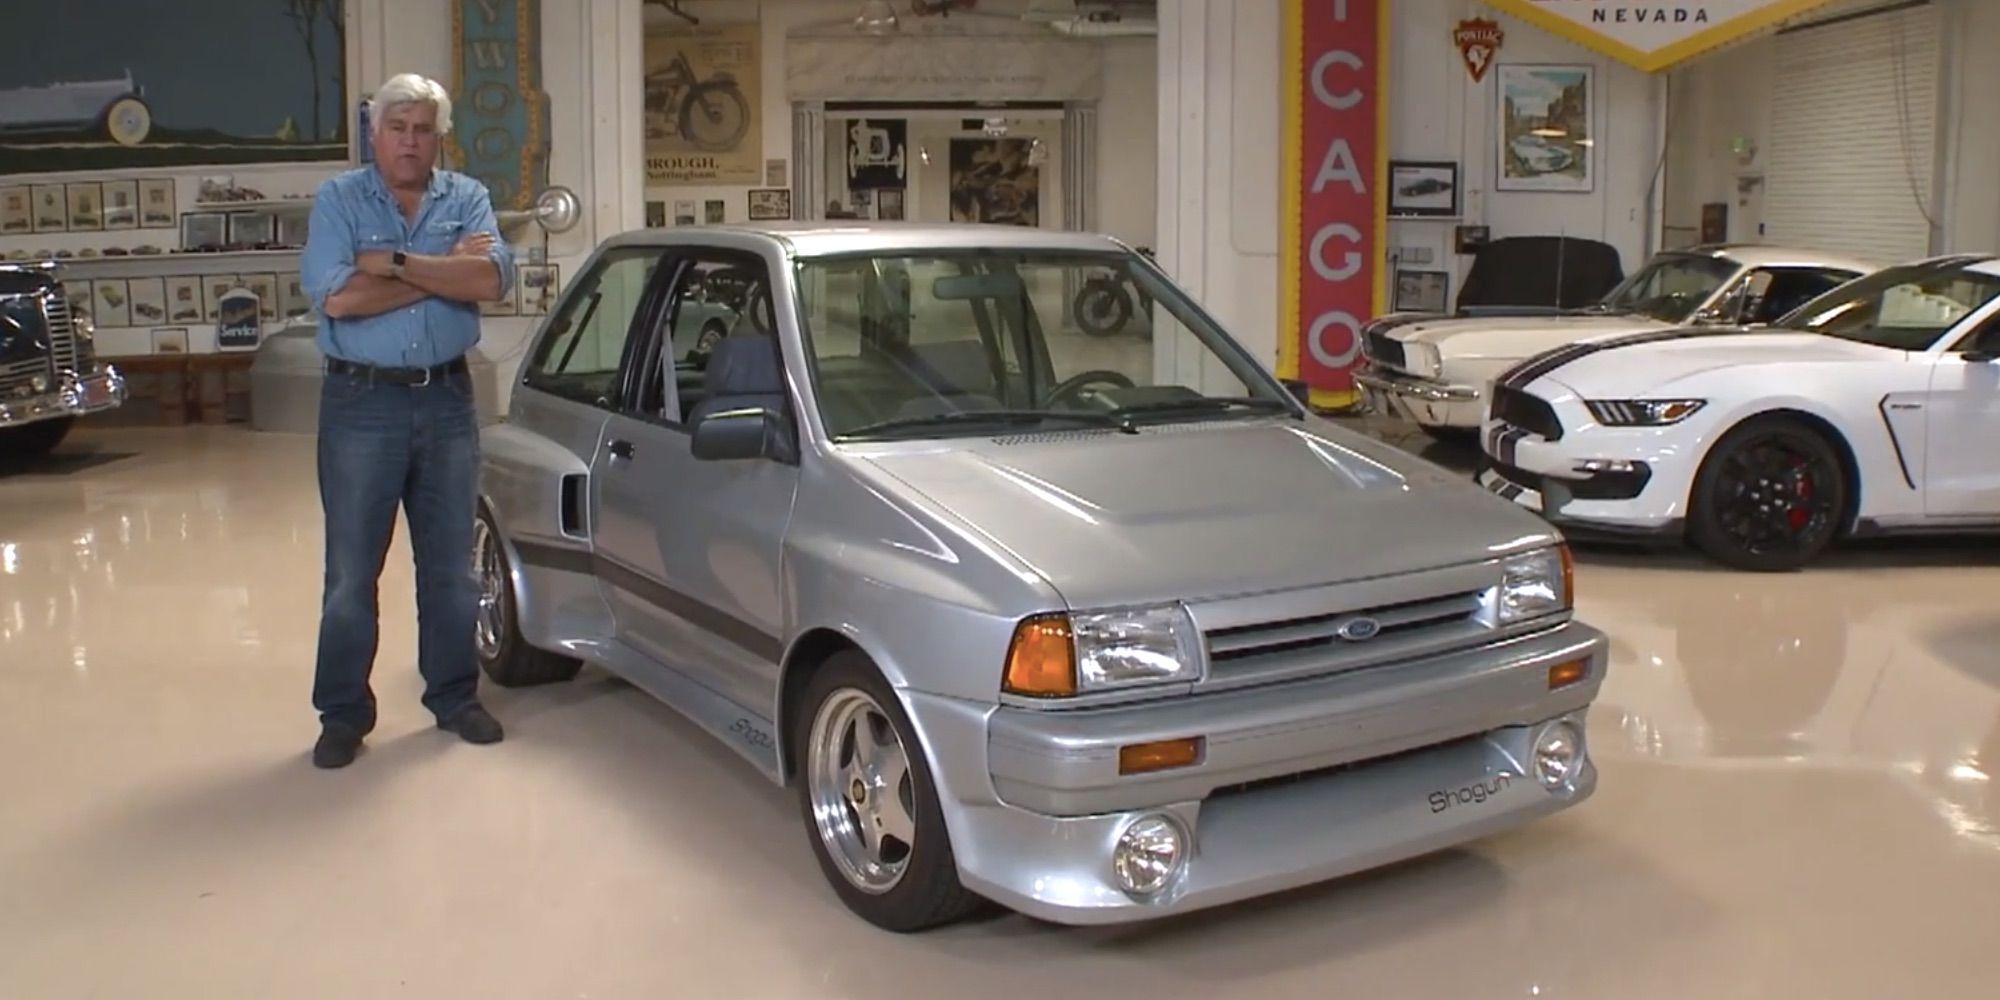 Jay Lenos Garage Leno Drives Ford Festiva Shogun 1461591620